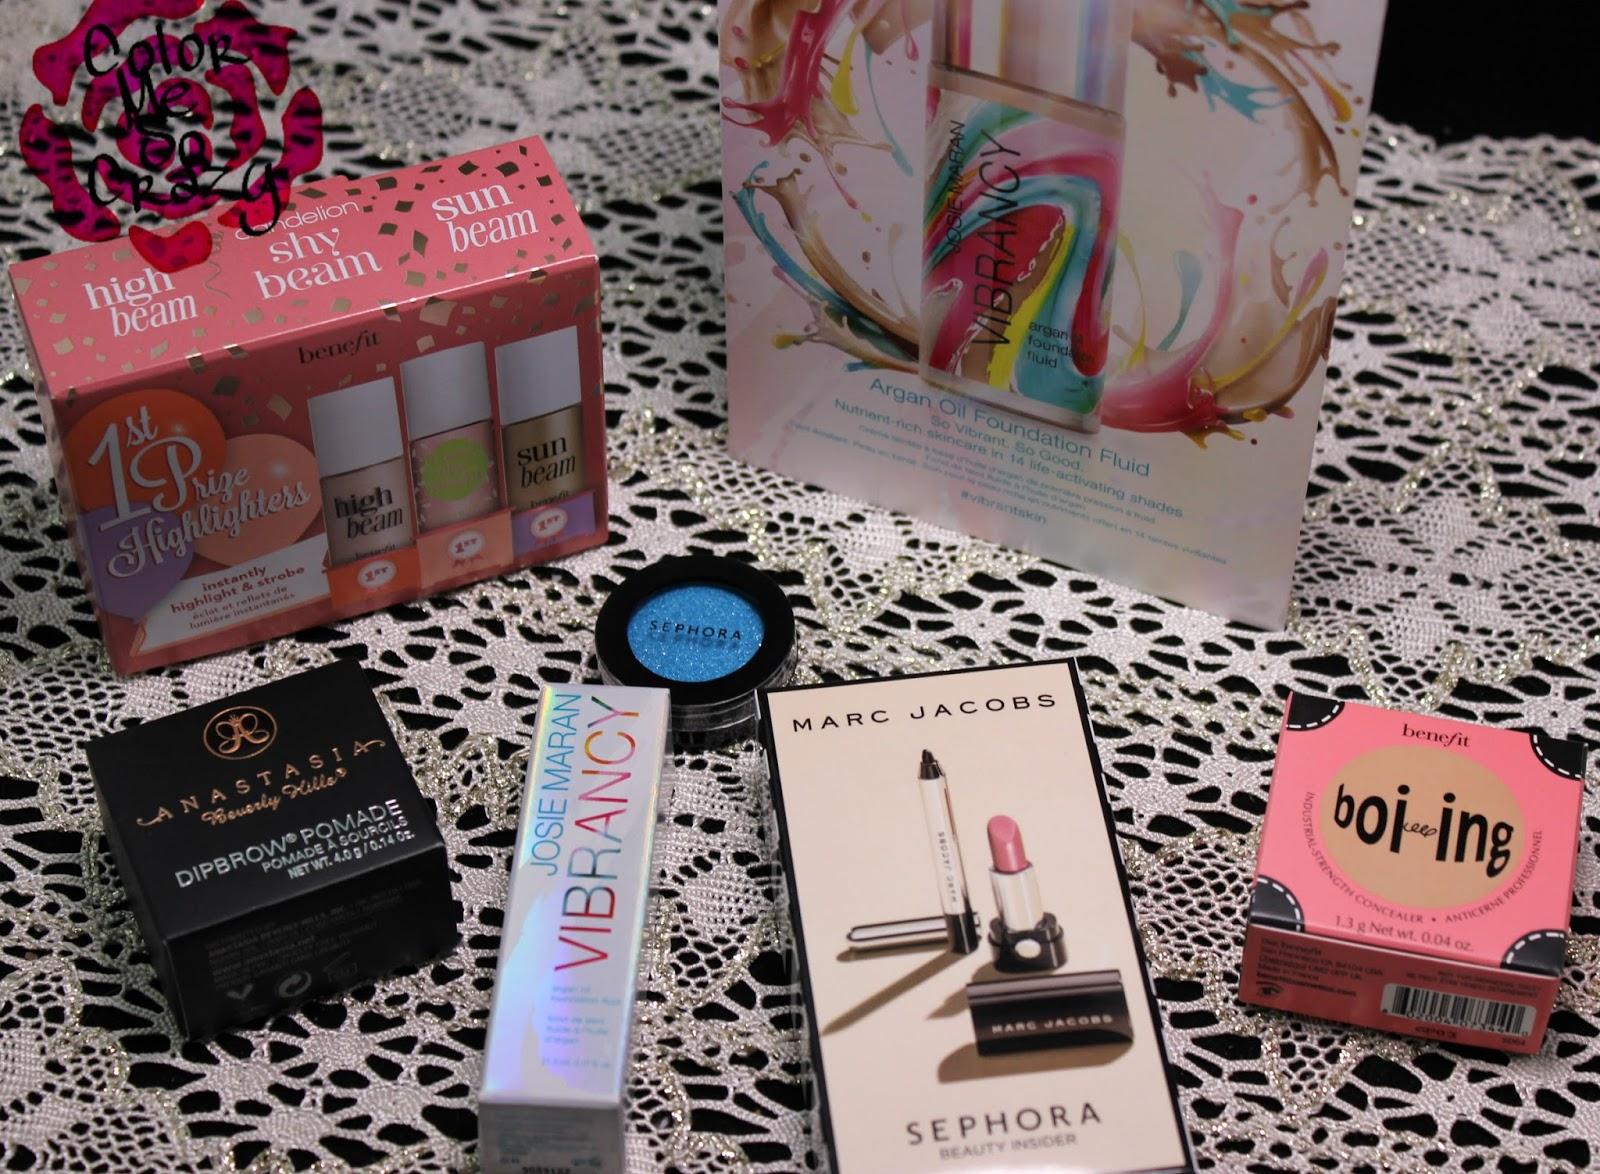 Benefit Anastasia Beverly Hills Marc Jacobs Josie Maran Sephora Birthday Presents